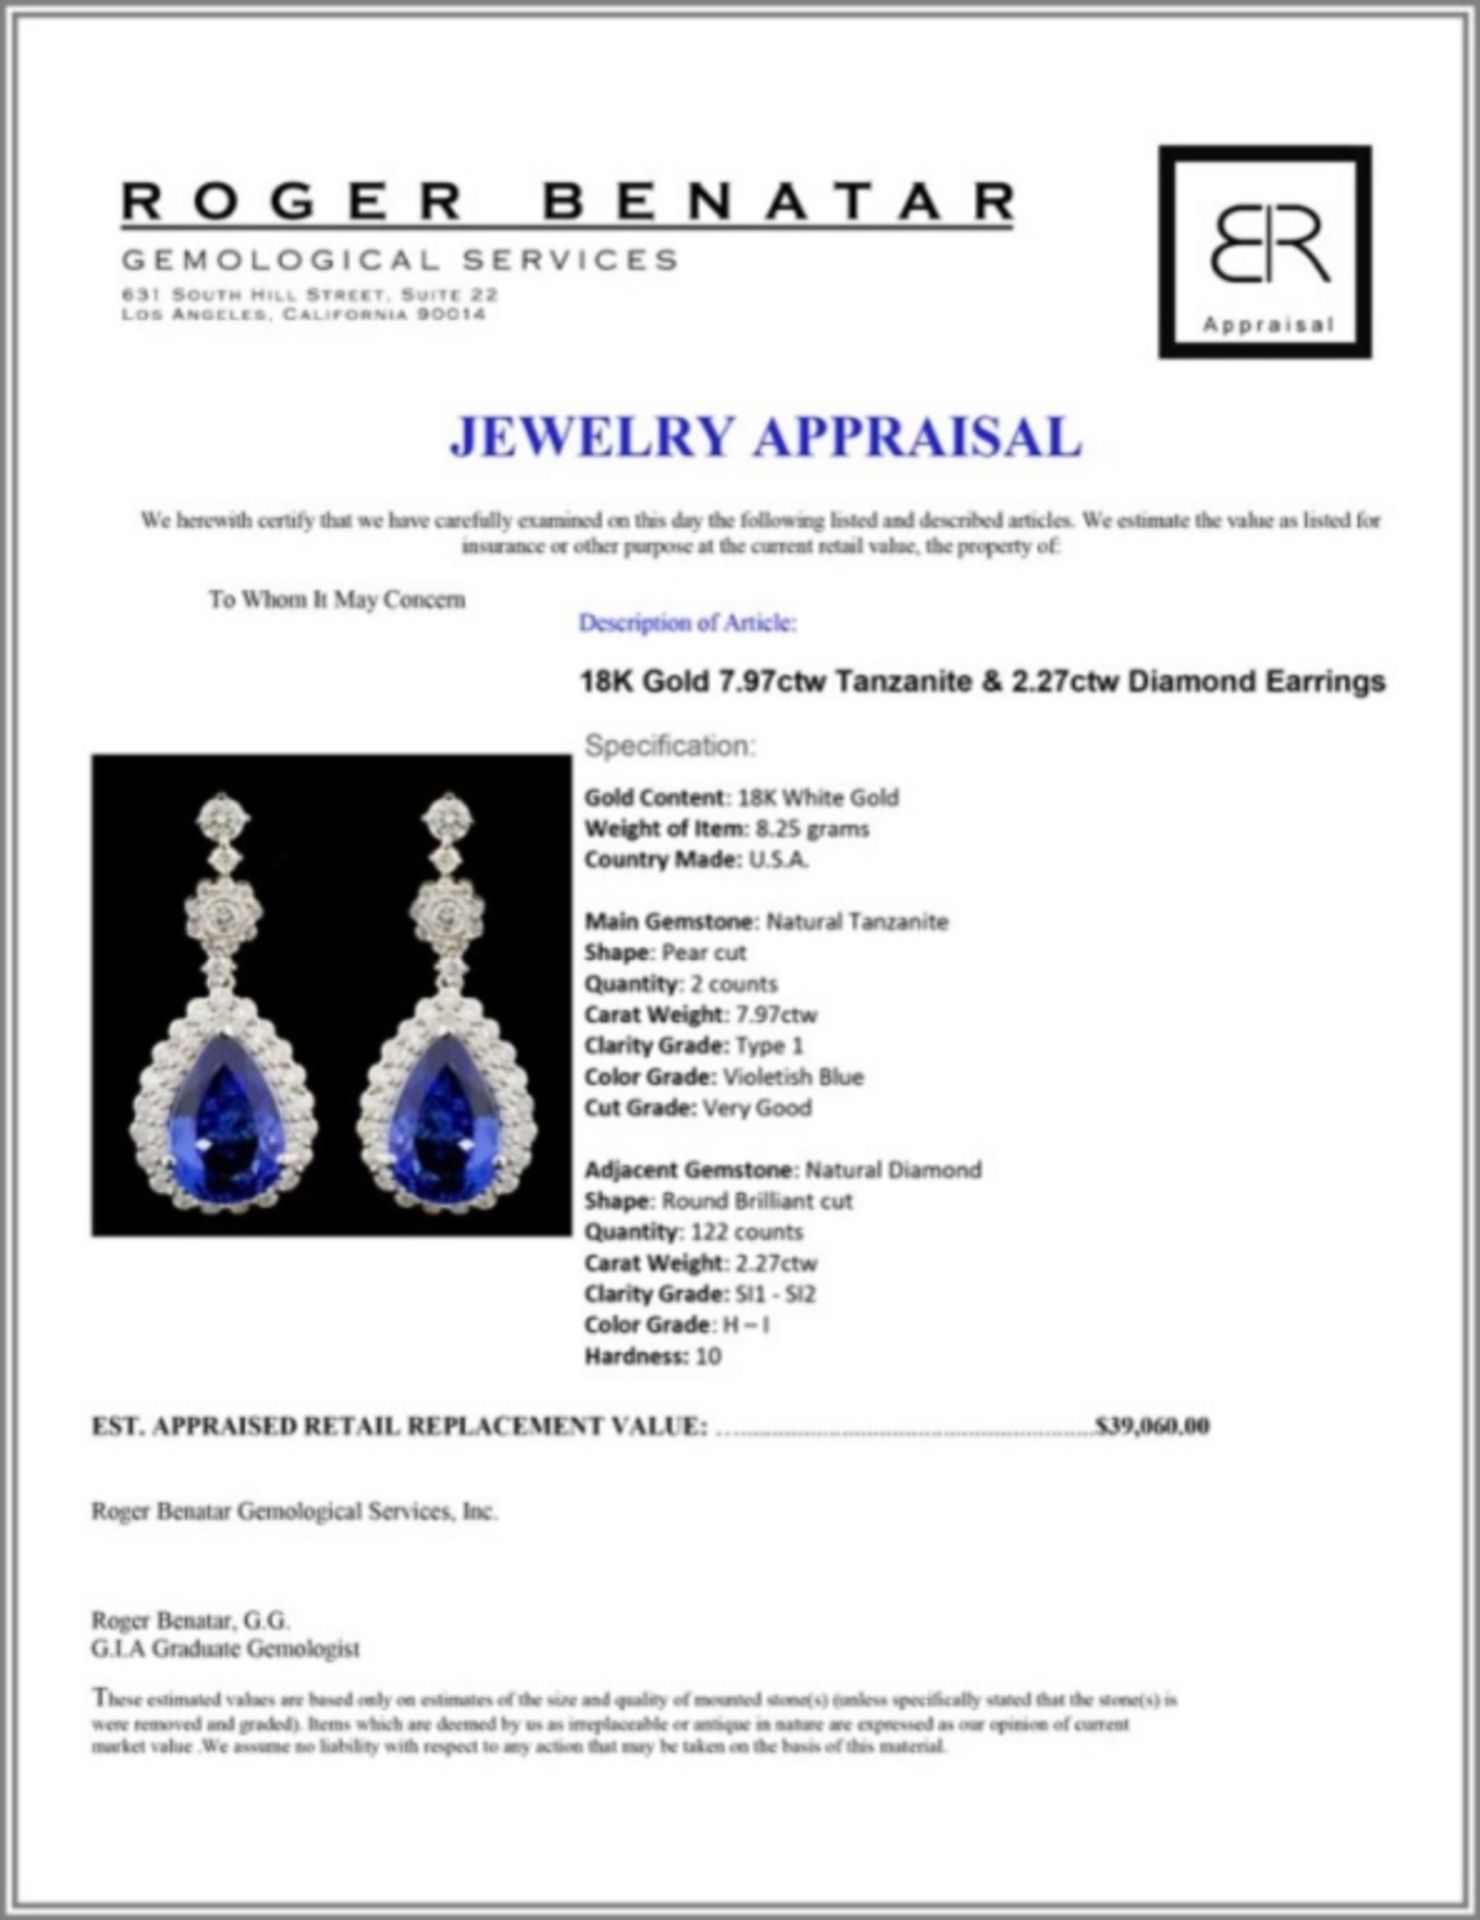 18K Gold 7.97ctw Tanzanite & 2.27ctw Diamond Earri - Image 3 of 3